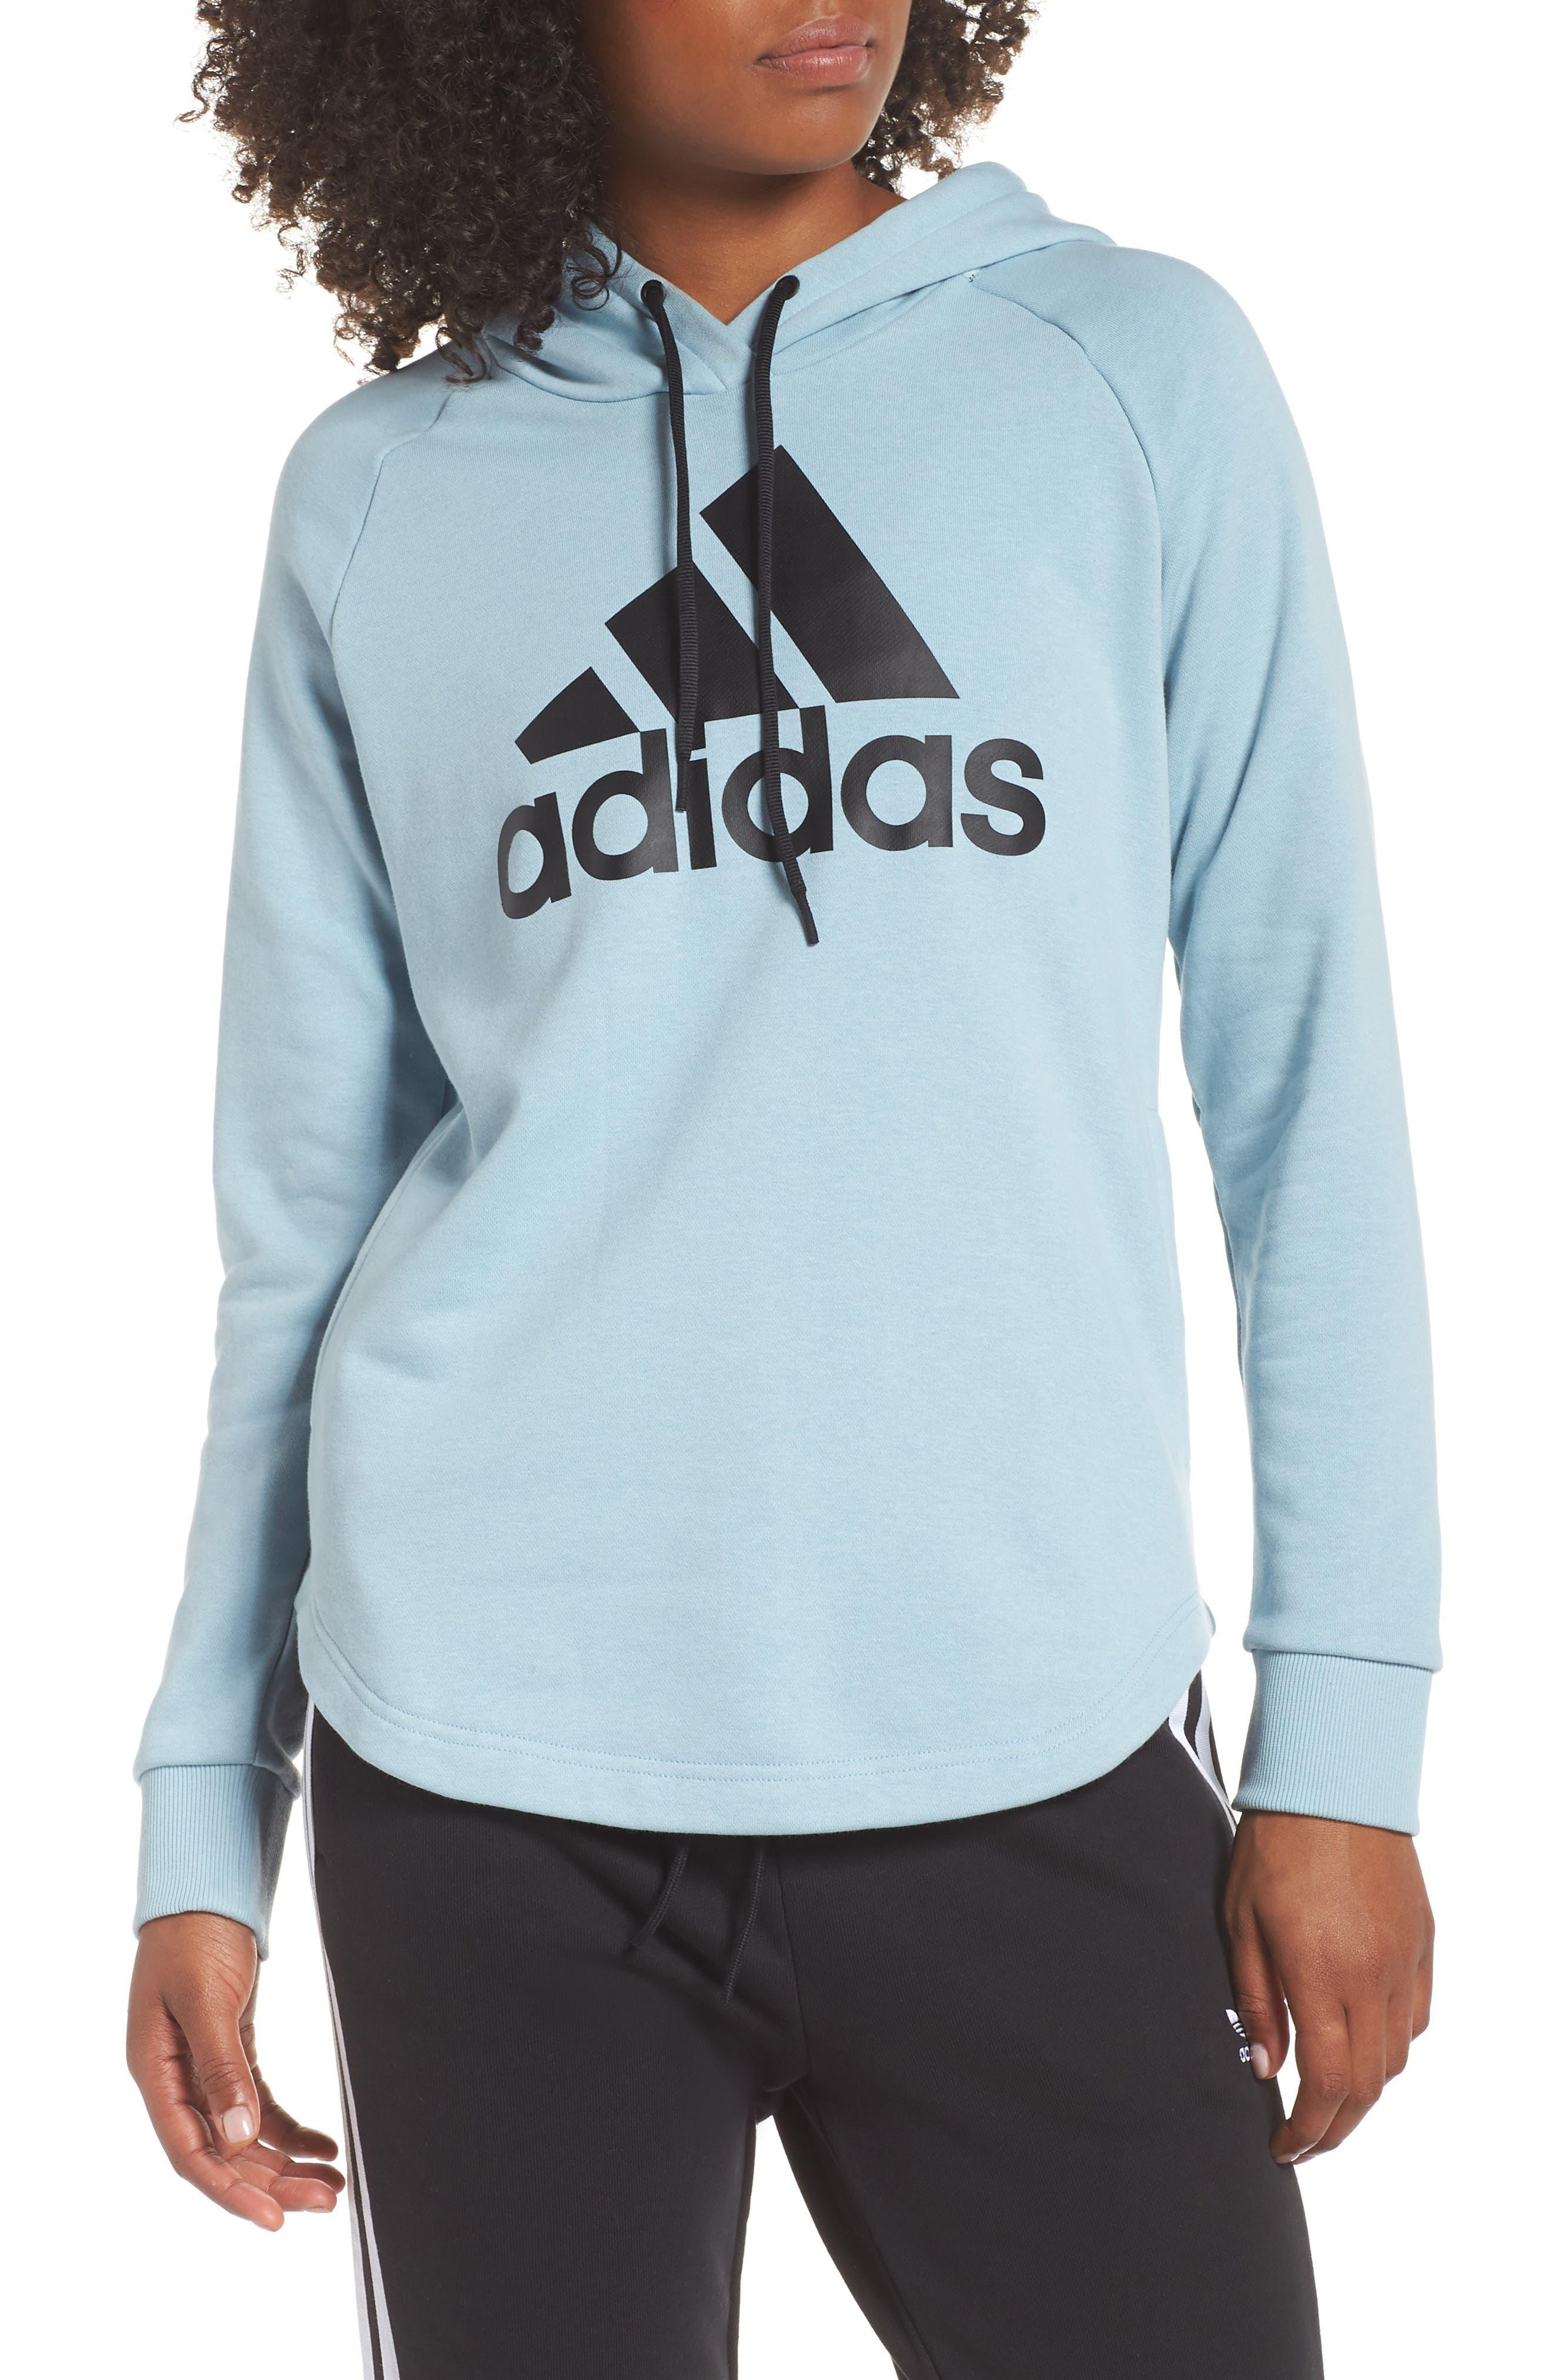 52b7e68512 adidas for Women  Clothing